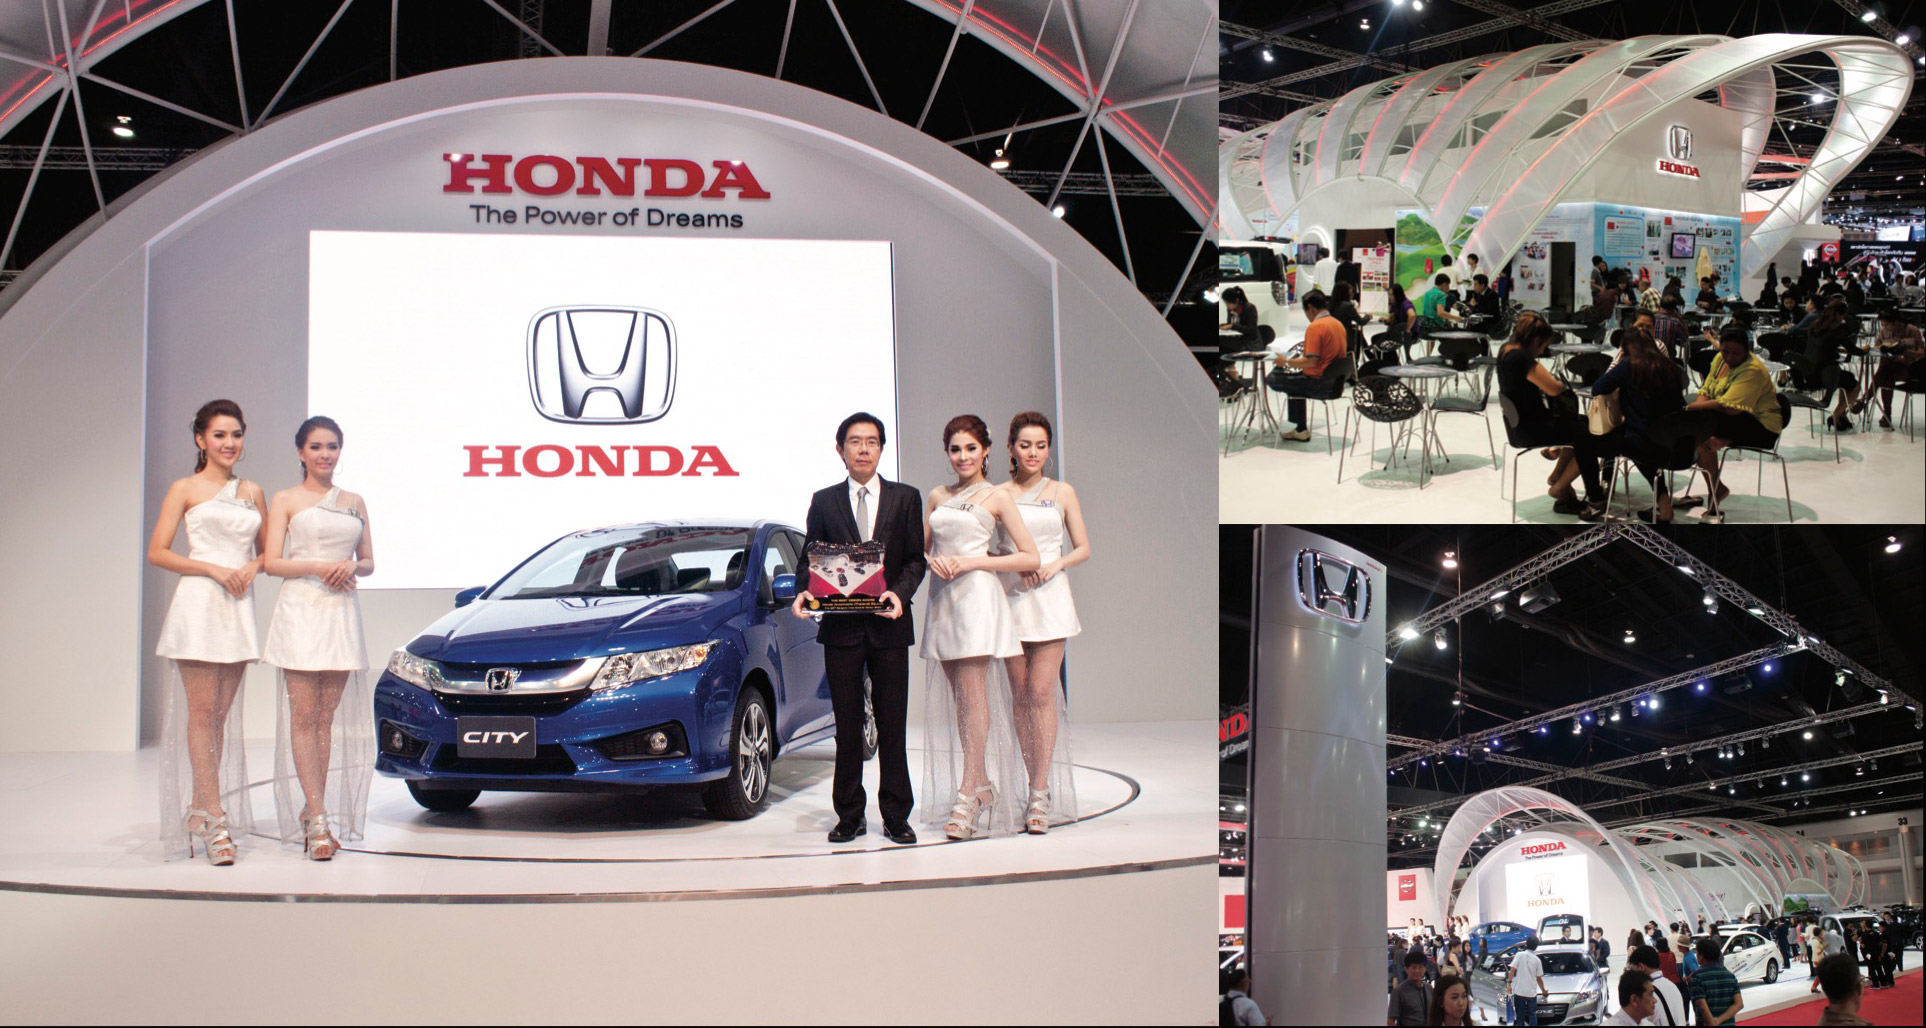 Honda Motorshow 2014 - conspiracy creative digital agency